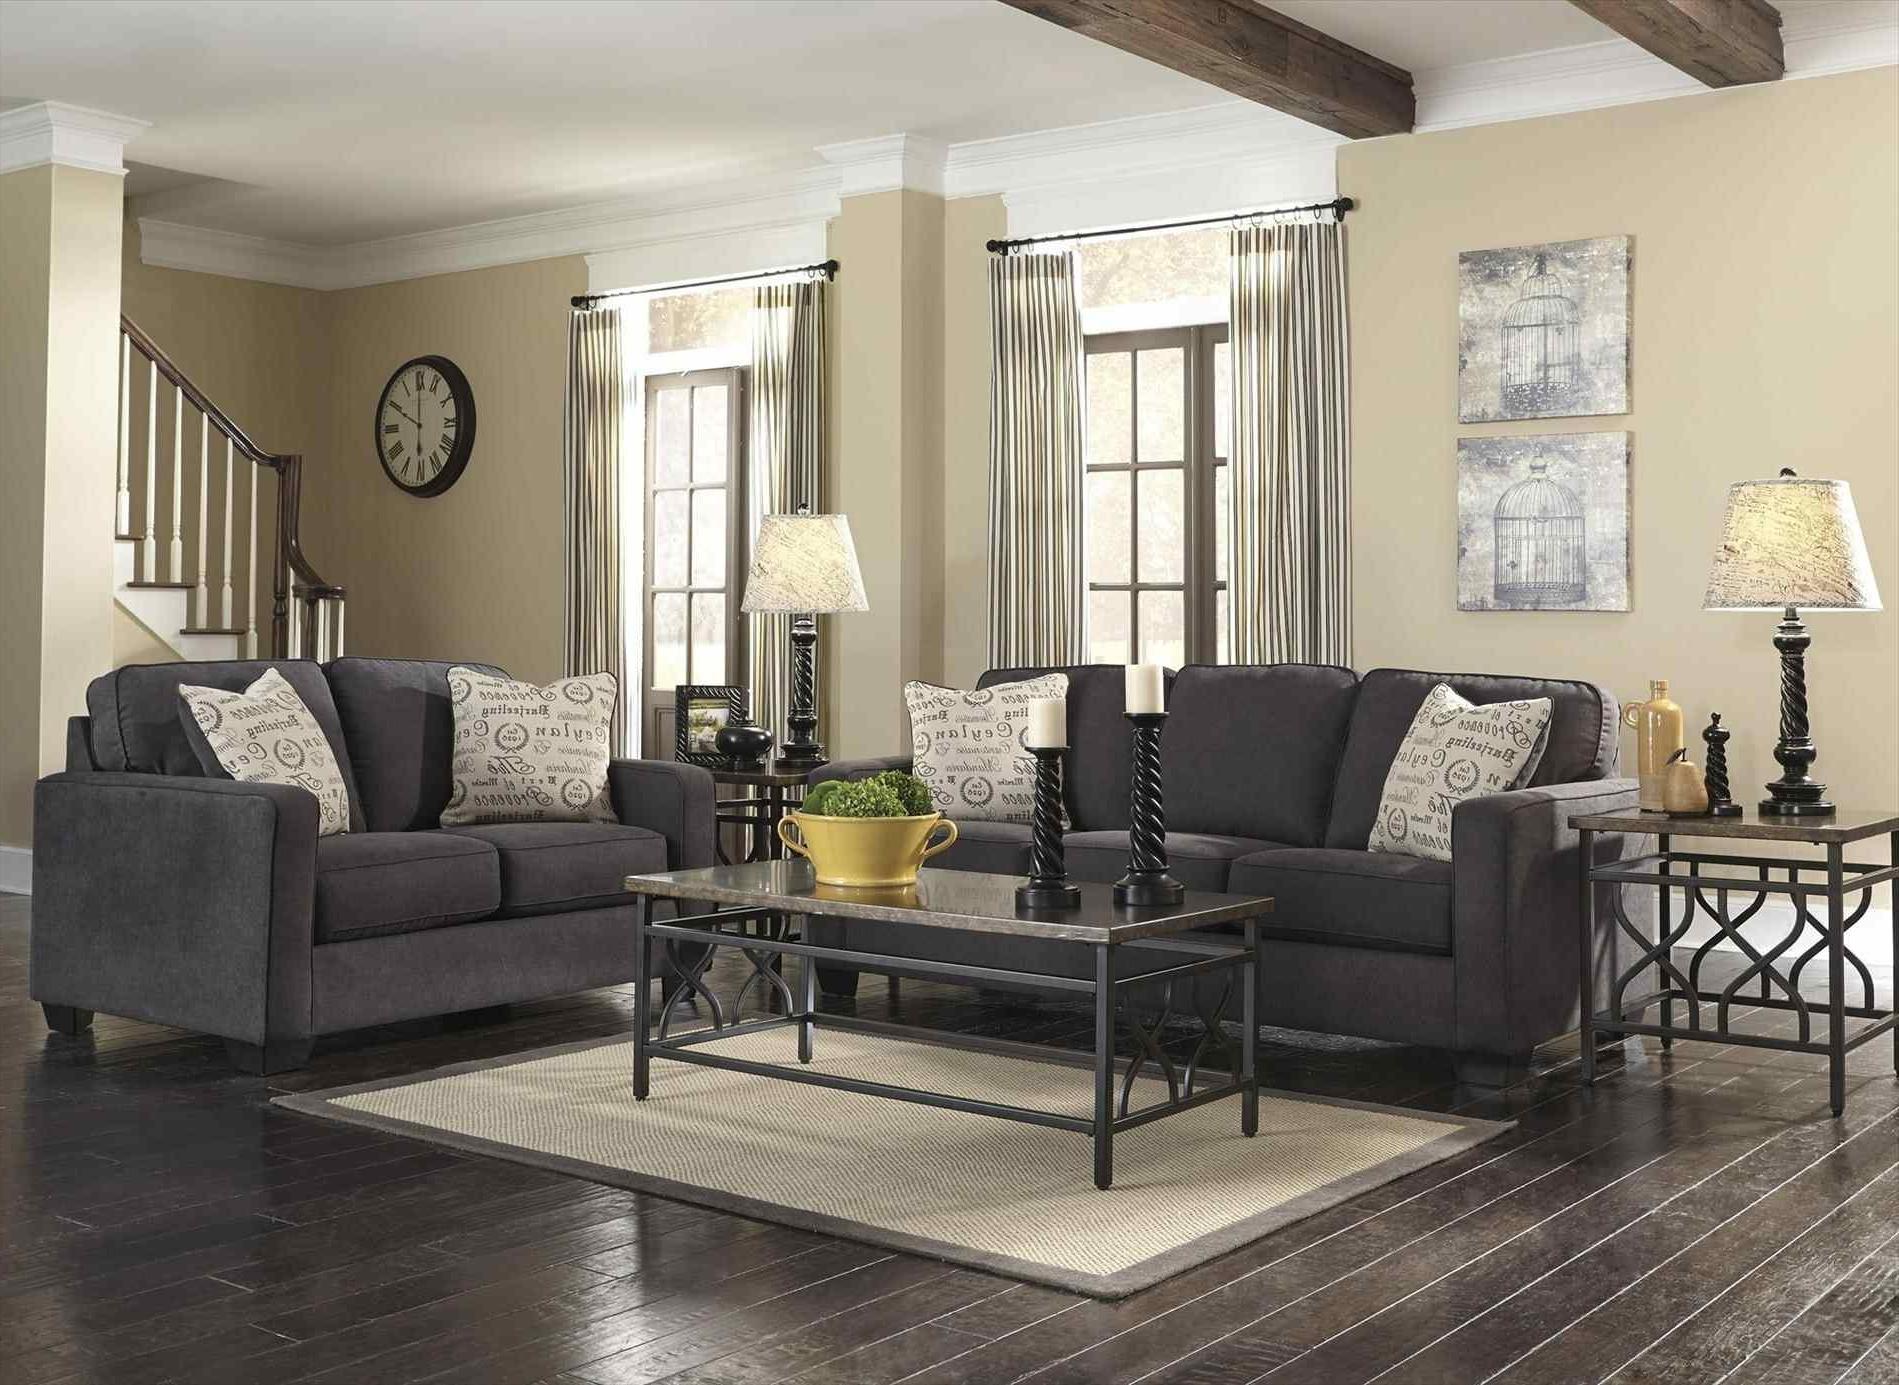 Latest Sam Levitz Sectional Sofas Regarding Couch : W Accent Pillows Sam Levitz Furniture Brindon Sofas Living (View 14 of 15)